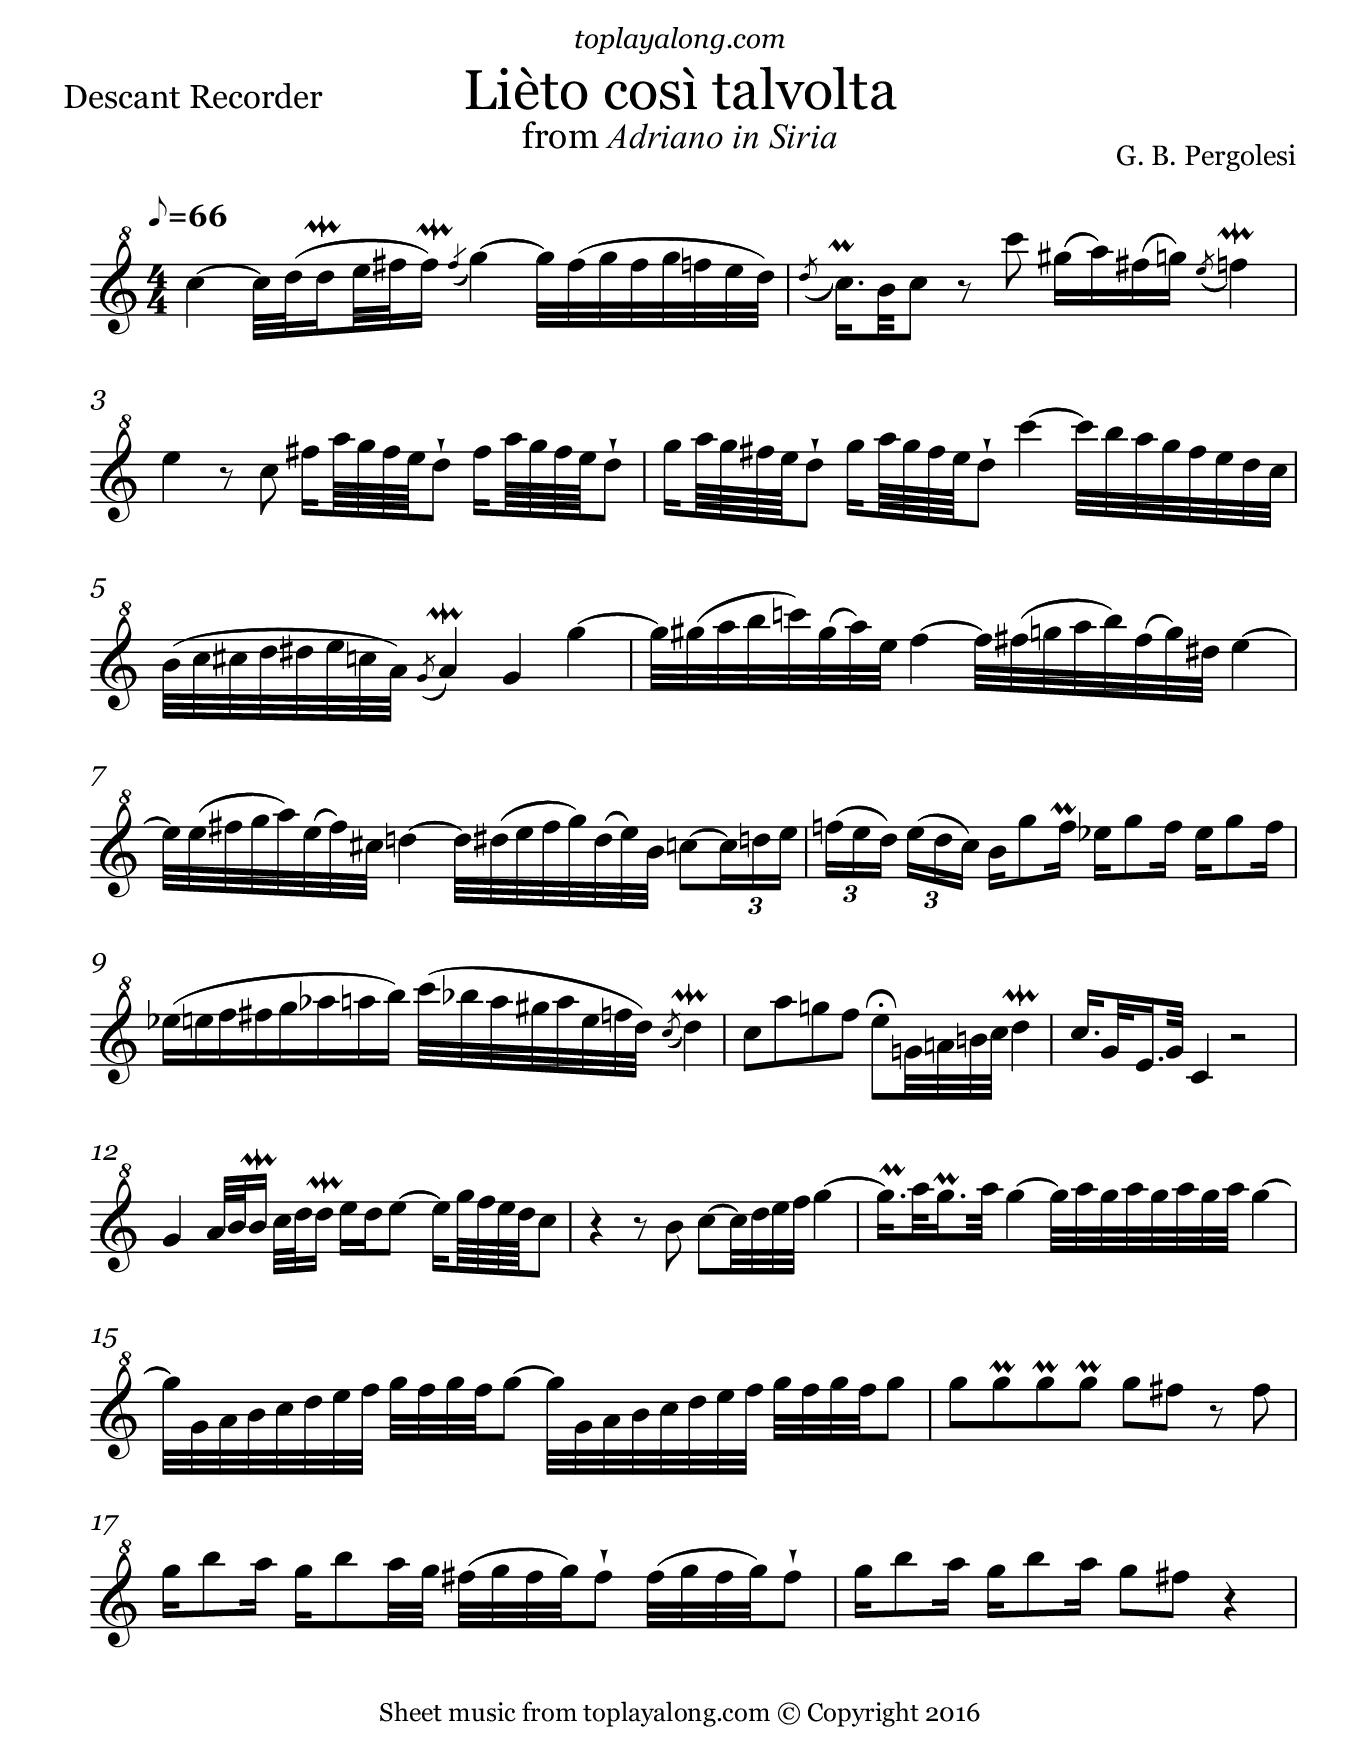 Lièto così talvolta from Adriano in Siria by Pergolesi. Sheet music for Recorder, page 1.